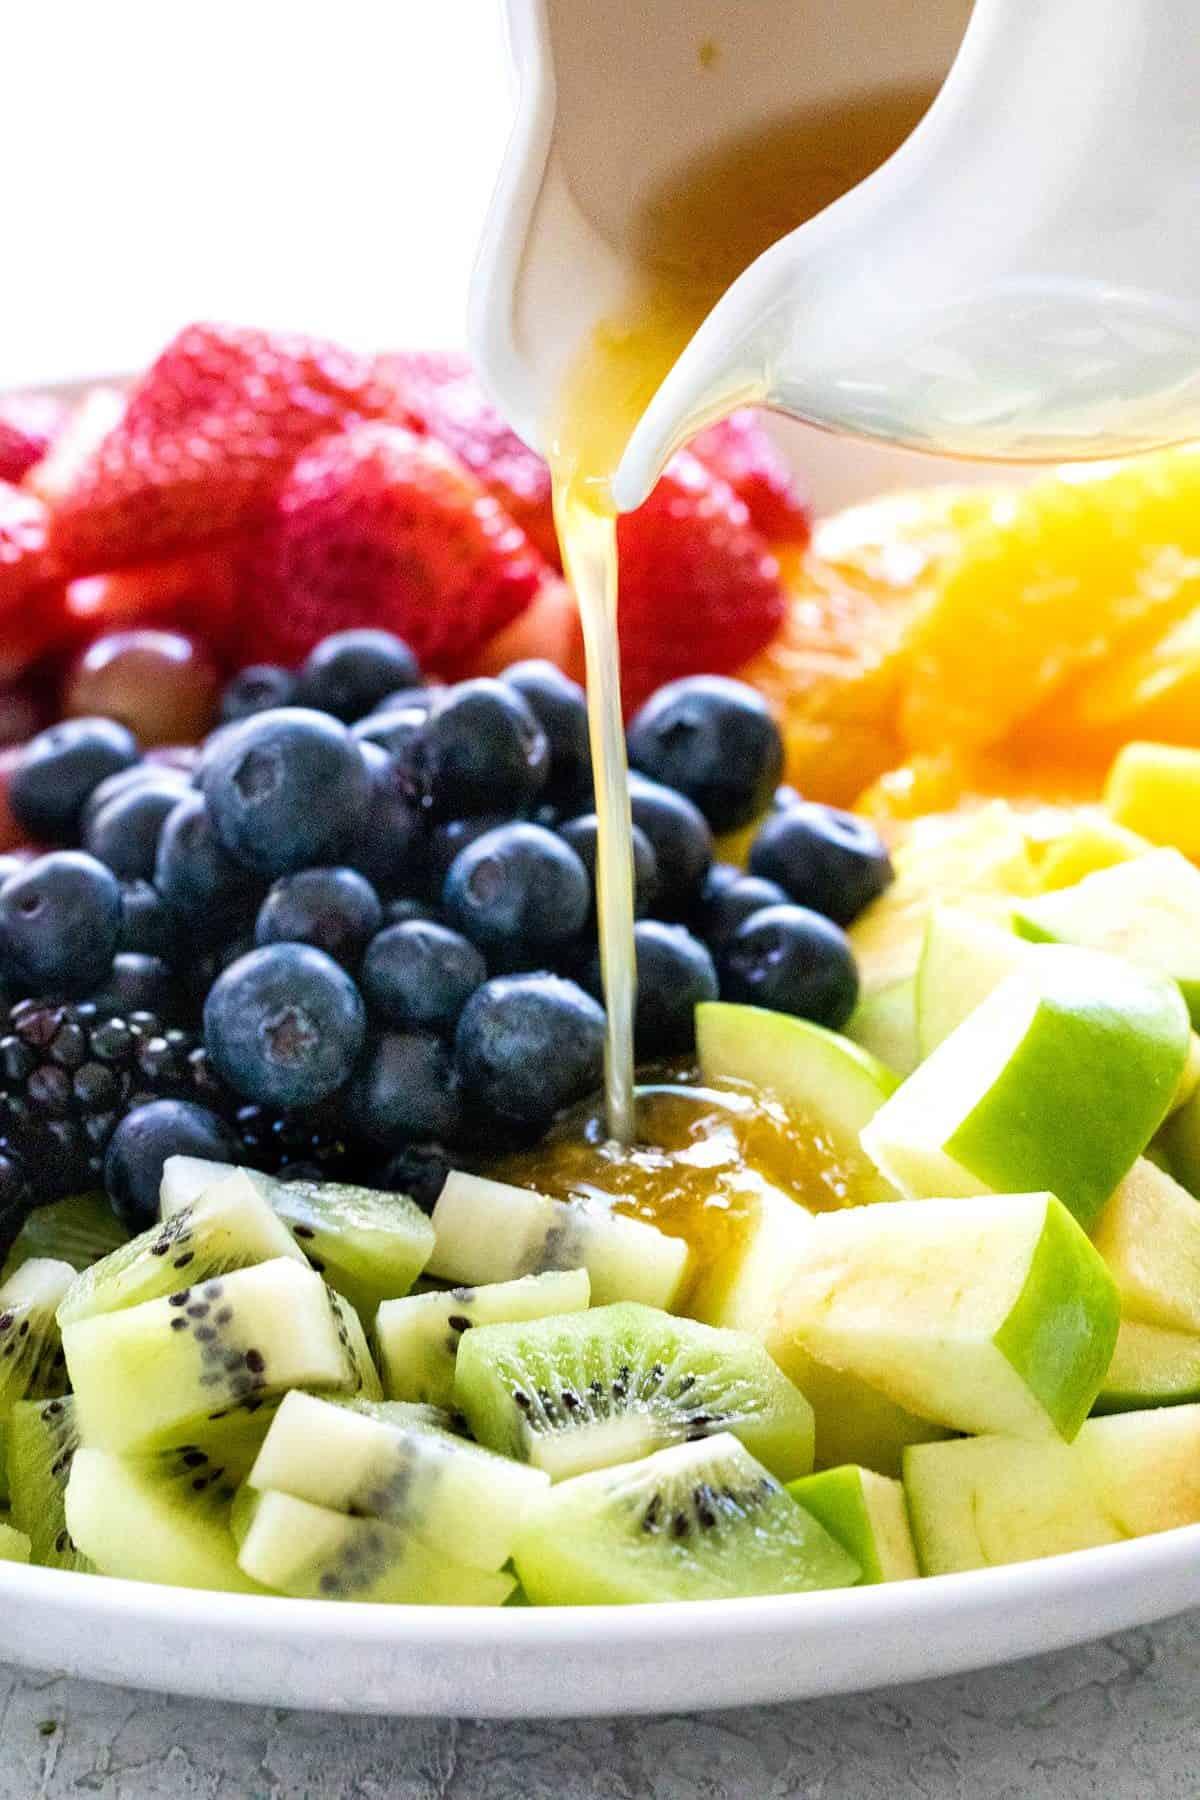 pouring salad dressing over fruit